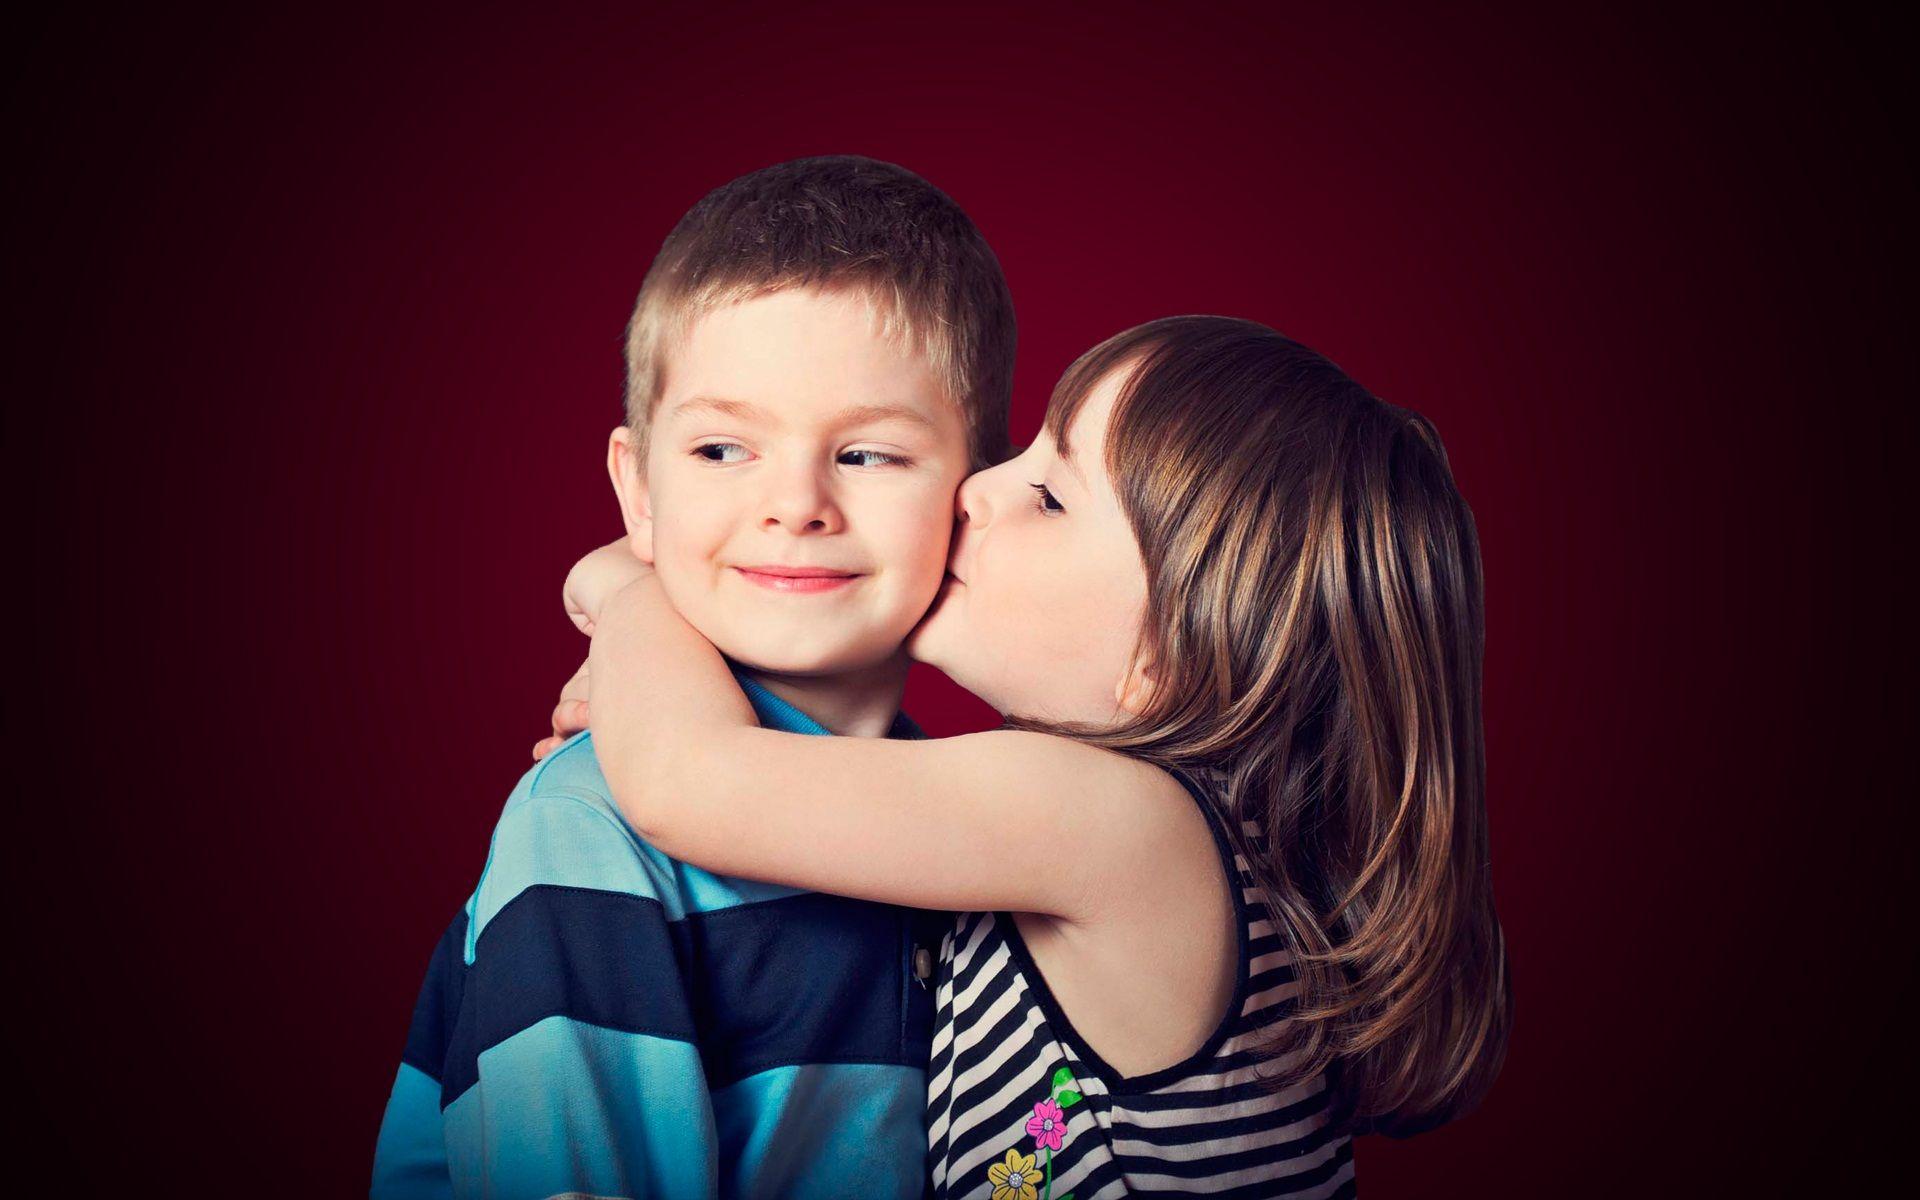 Romantic Hug And Kisses Wallpaper